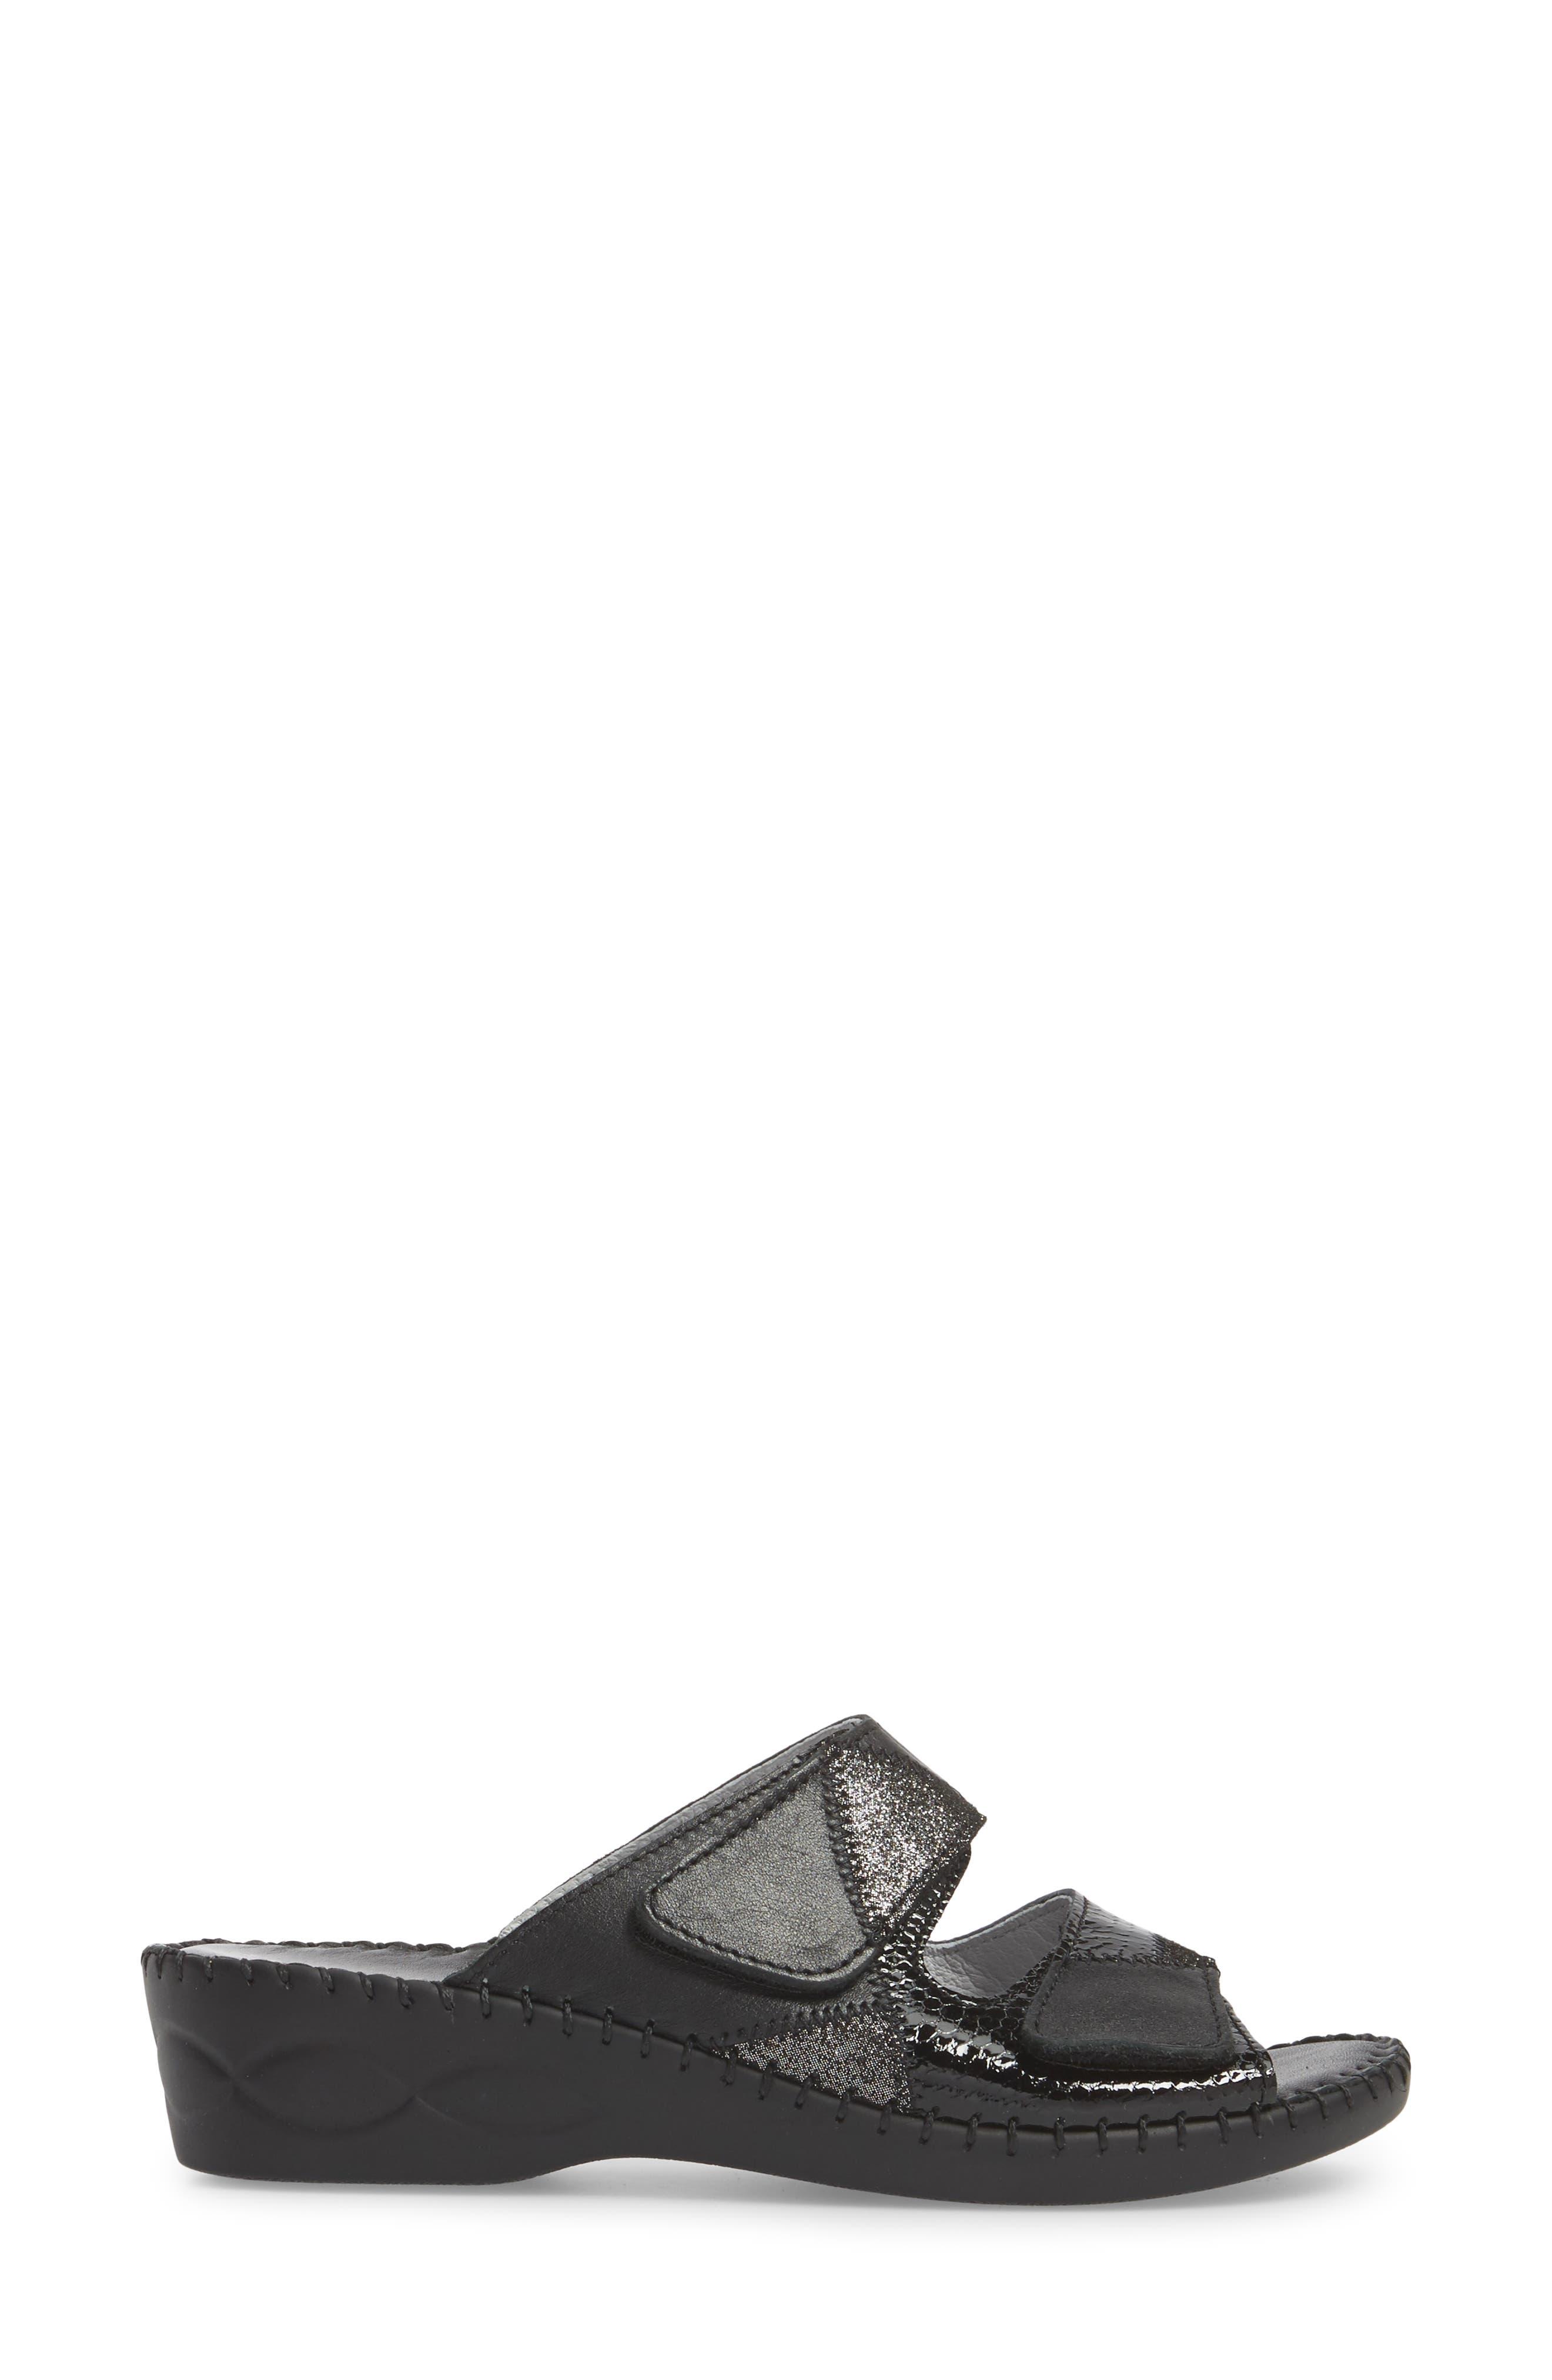 Flex Slide Sandal,                             Alternate thumbnail 3, color,                             BLACK LEATHER